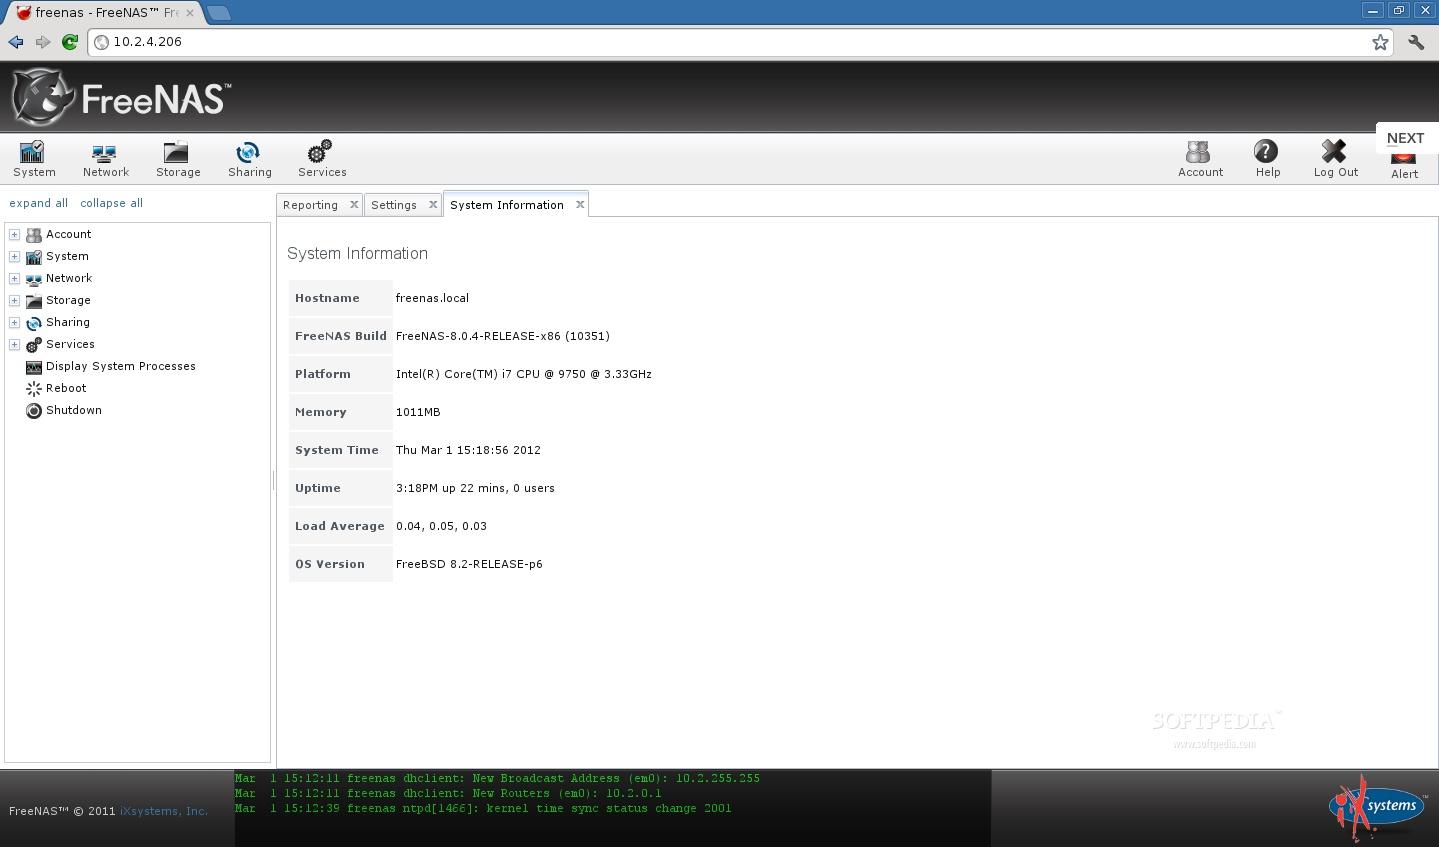 Download FreeNAS 11 2 Update 5